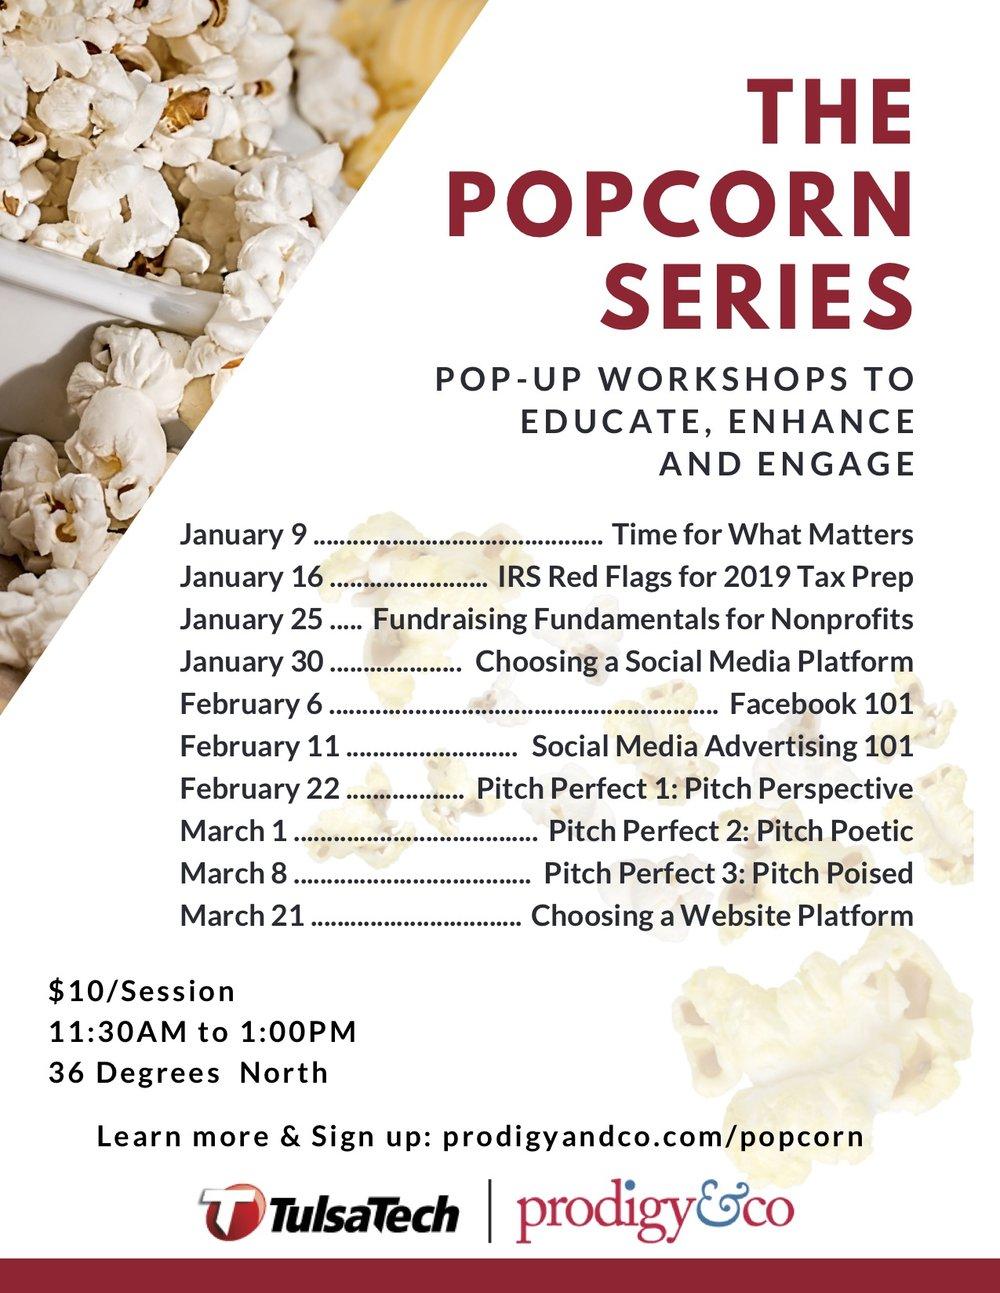 Popcorn Series 2019 Q1 Flyer.jpg